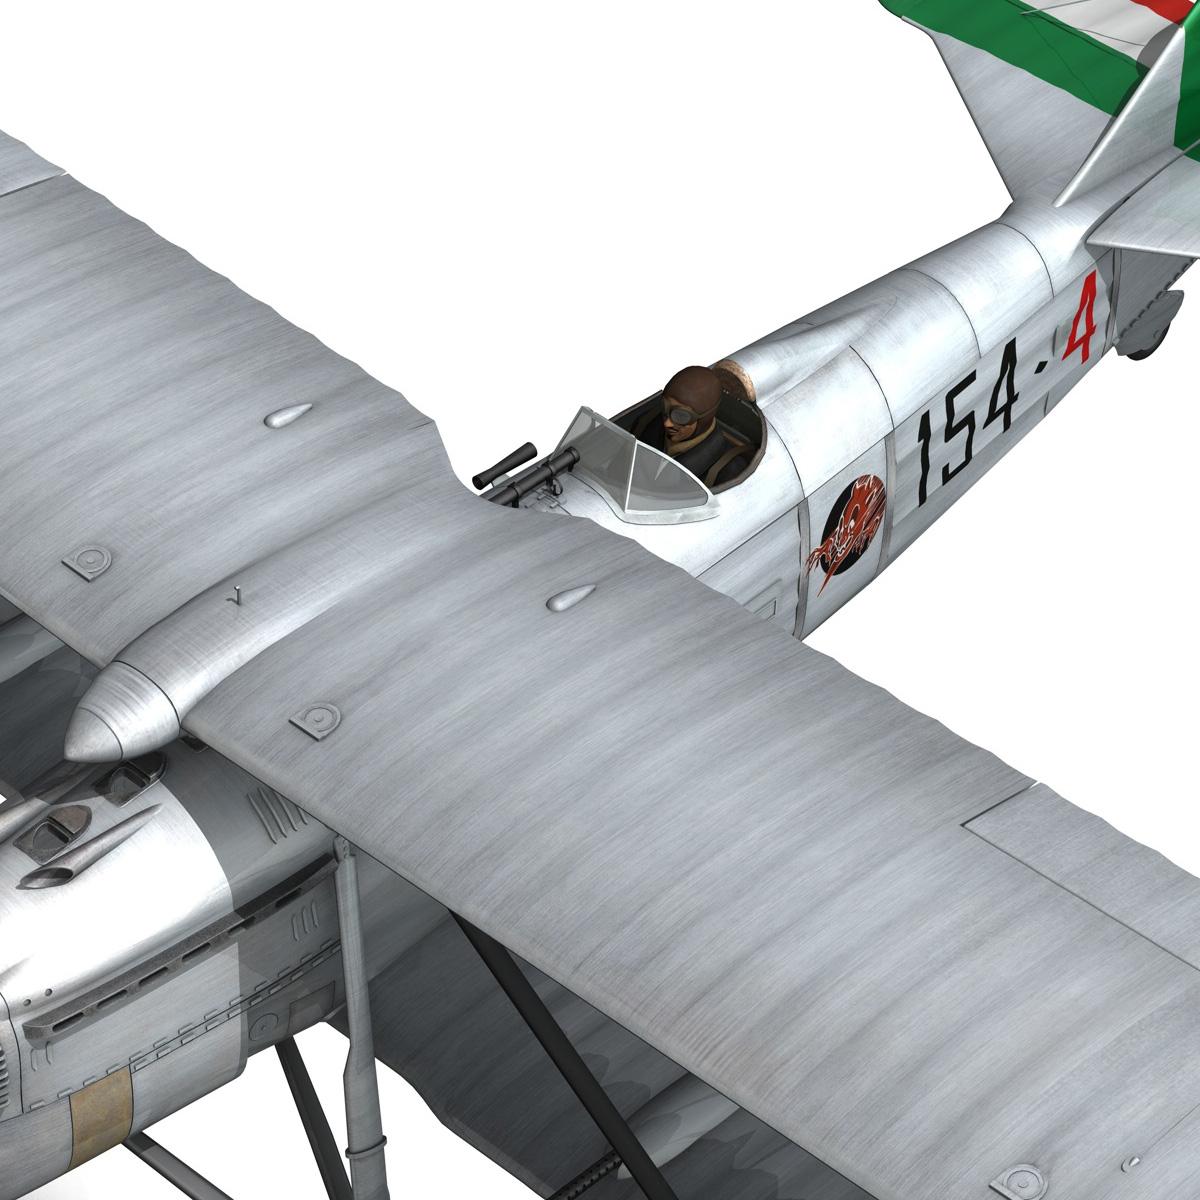 fiat cr.32 – italy airforce – 154 squadriglia 3d model fbx c4d lwo obj 268145